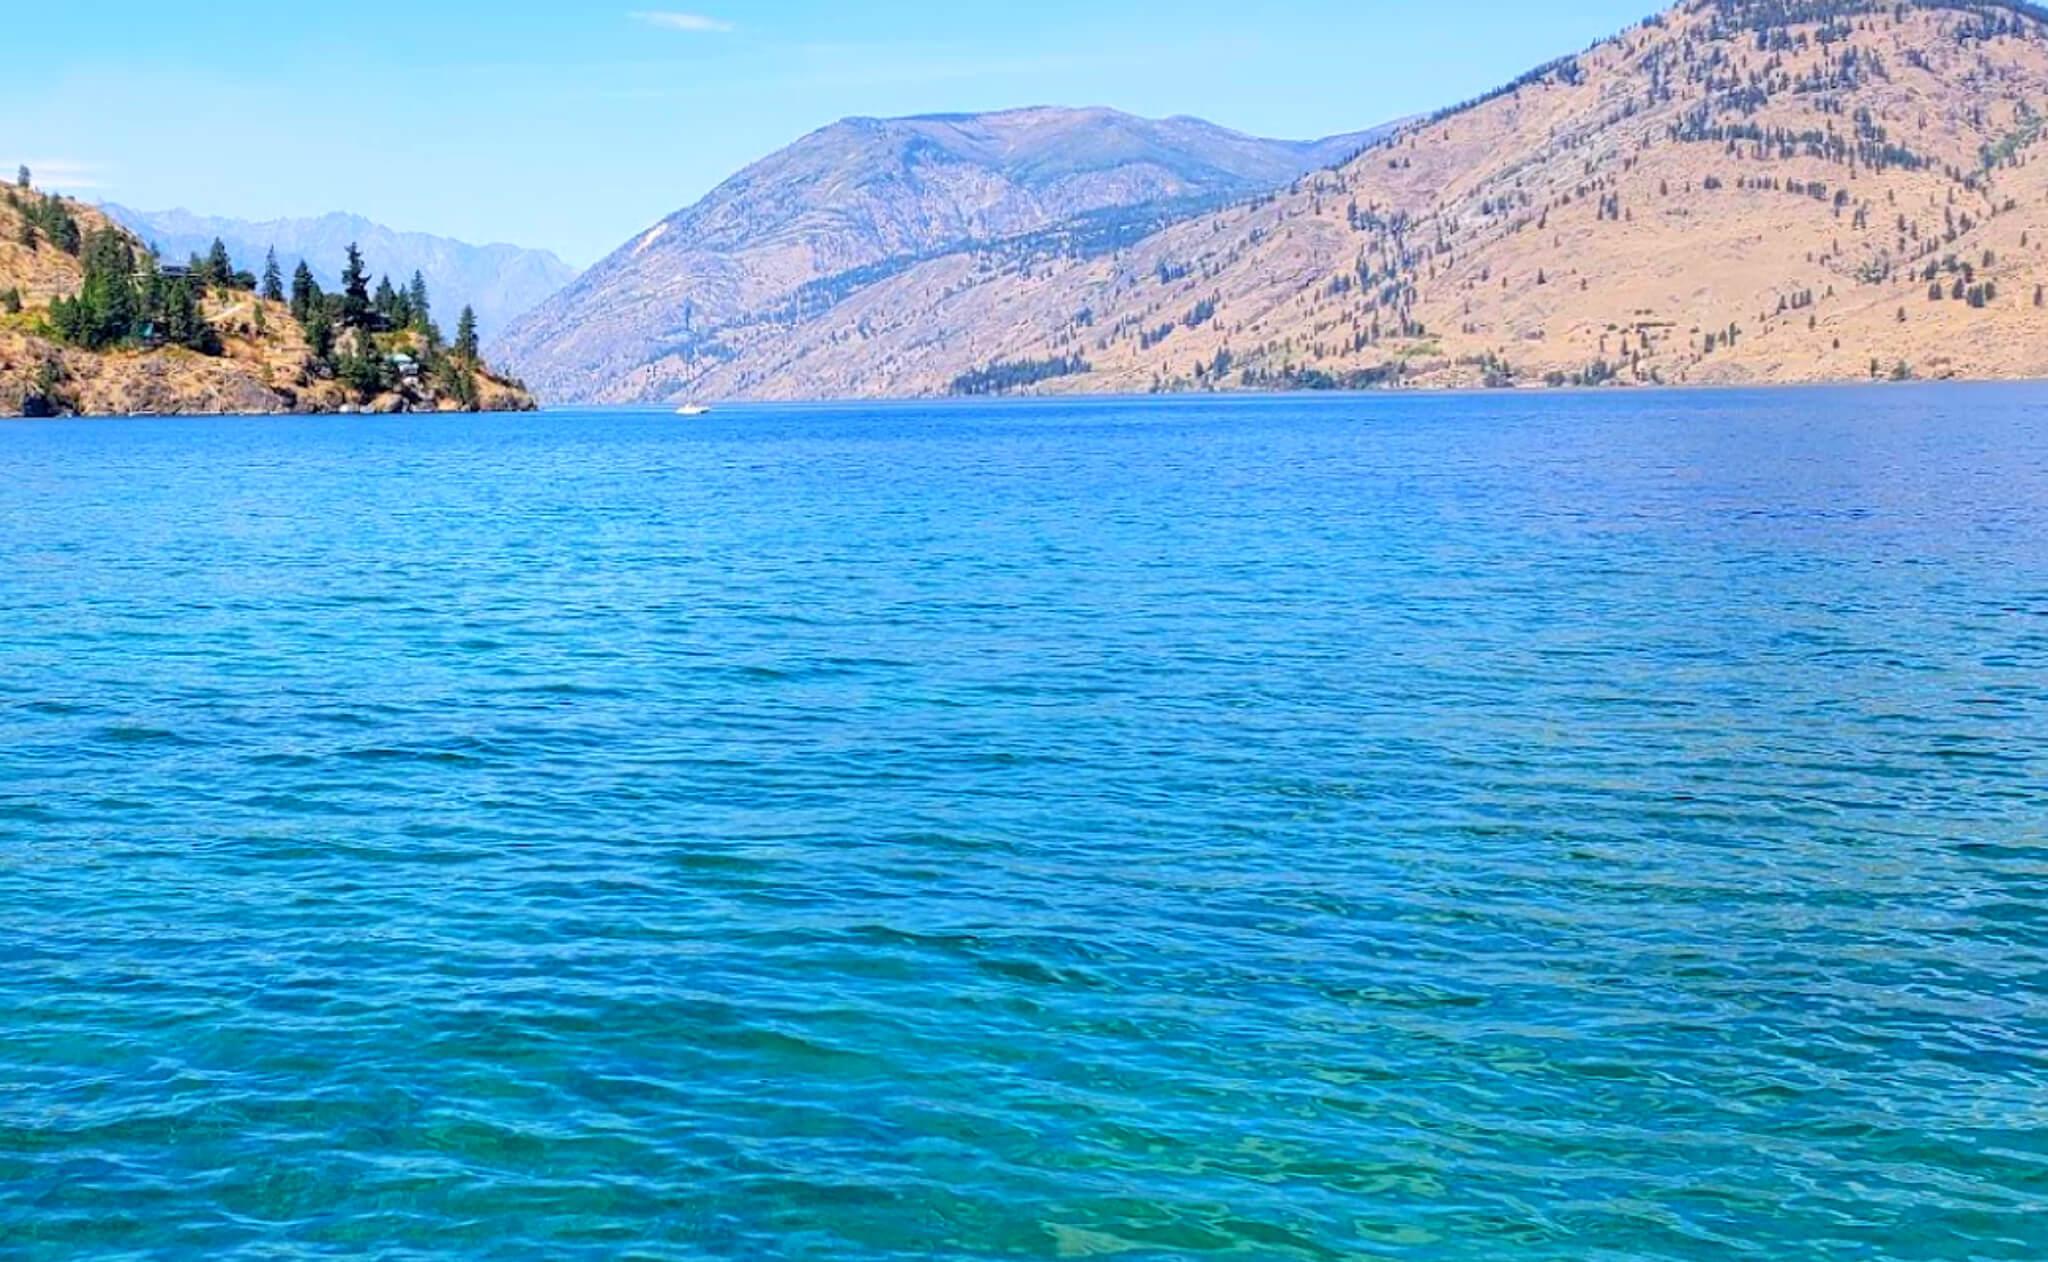 Chelan-Lake-Fishing-Report-Guide-Washington-07